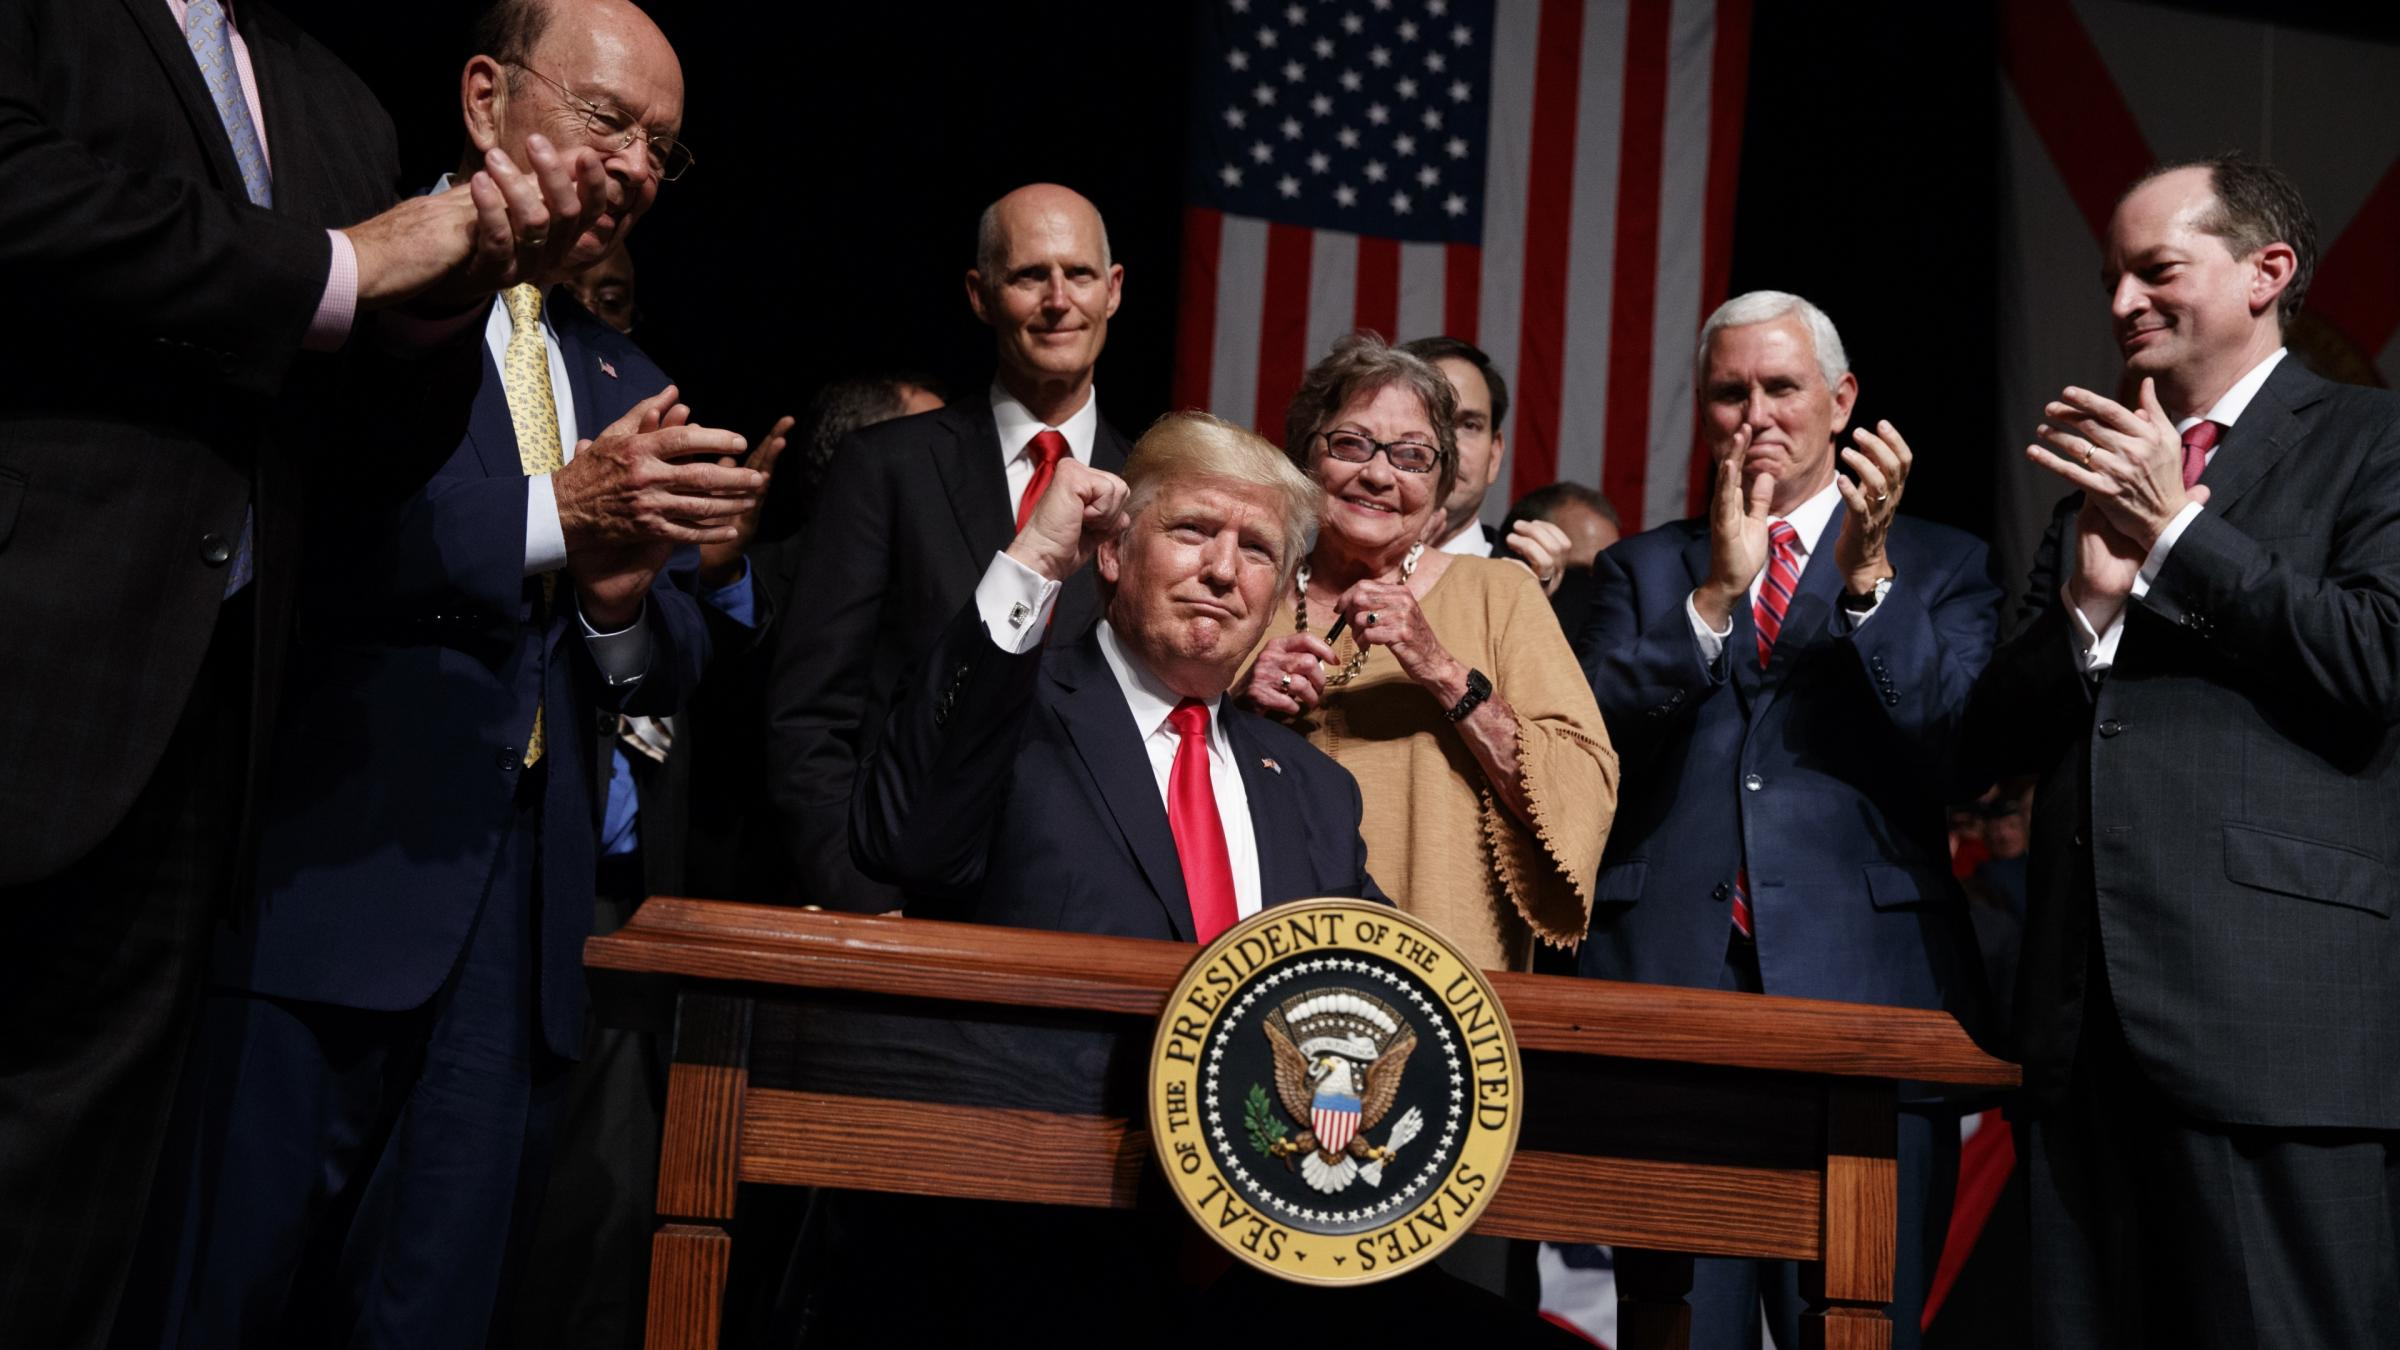 Donald Trump restores travel and economic restrictions on Cuba